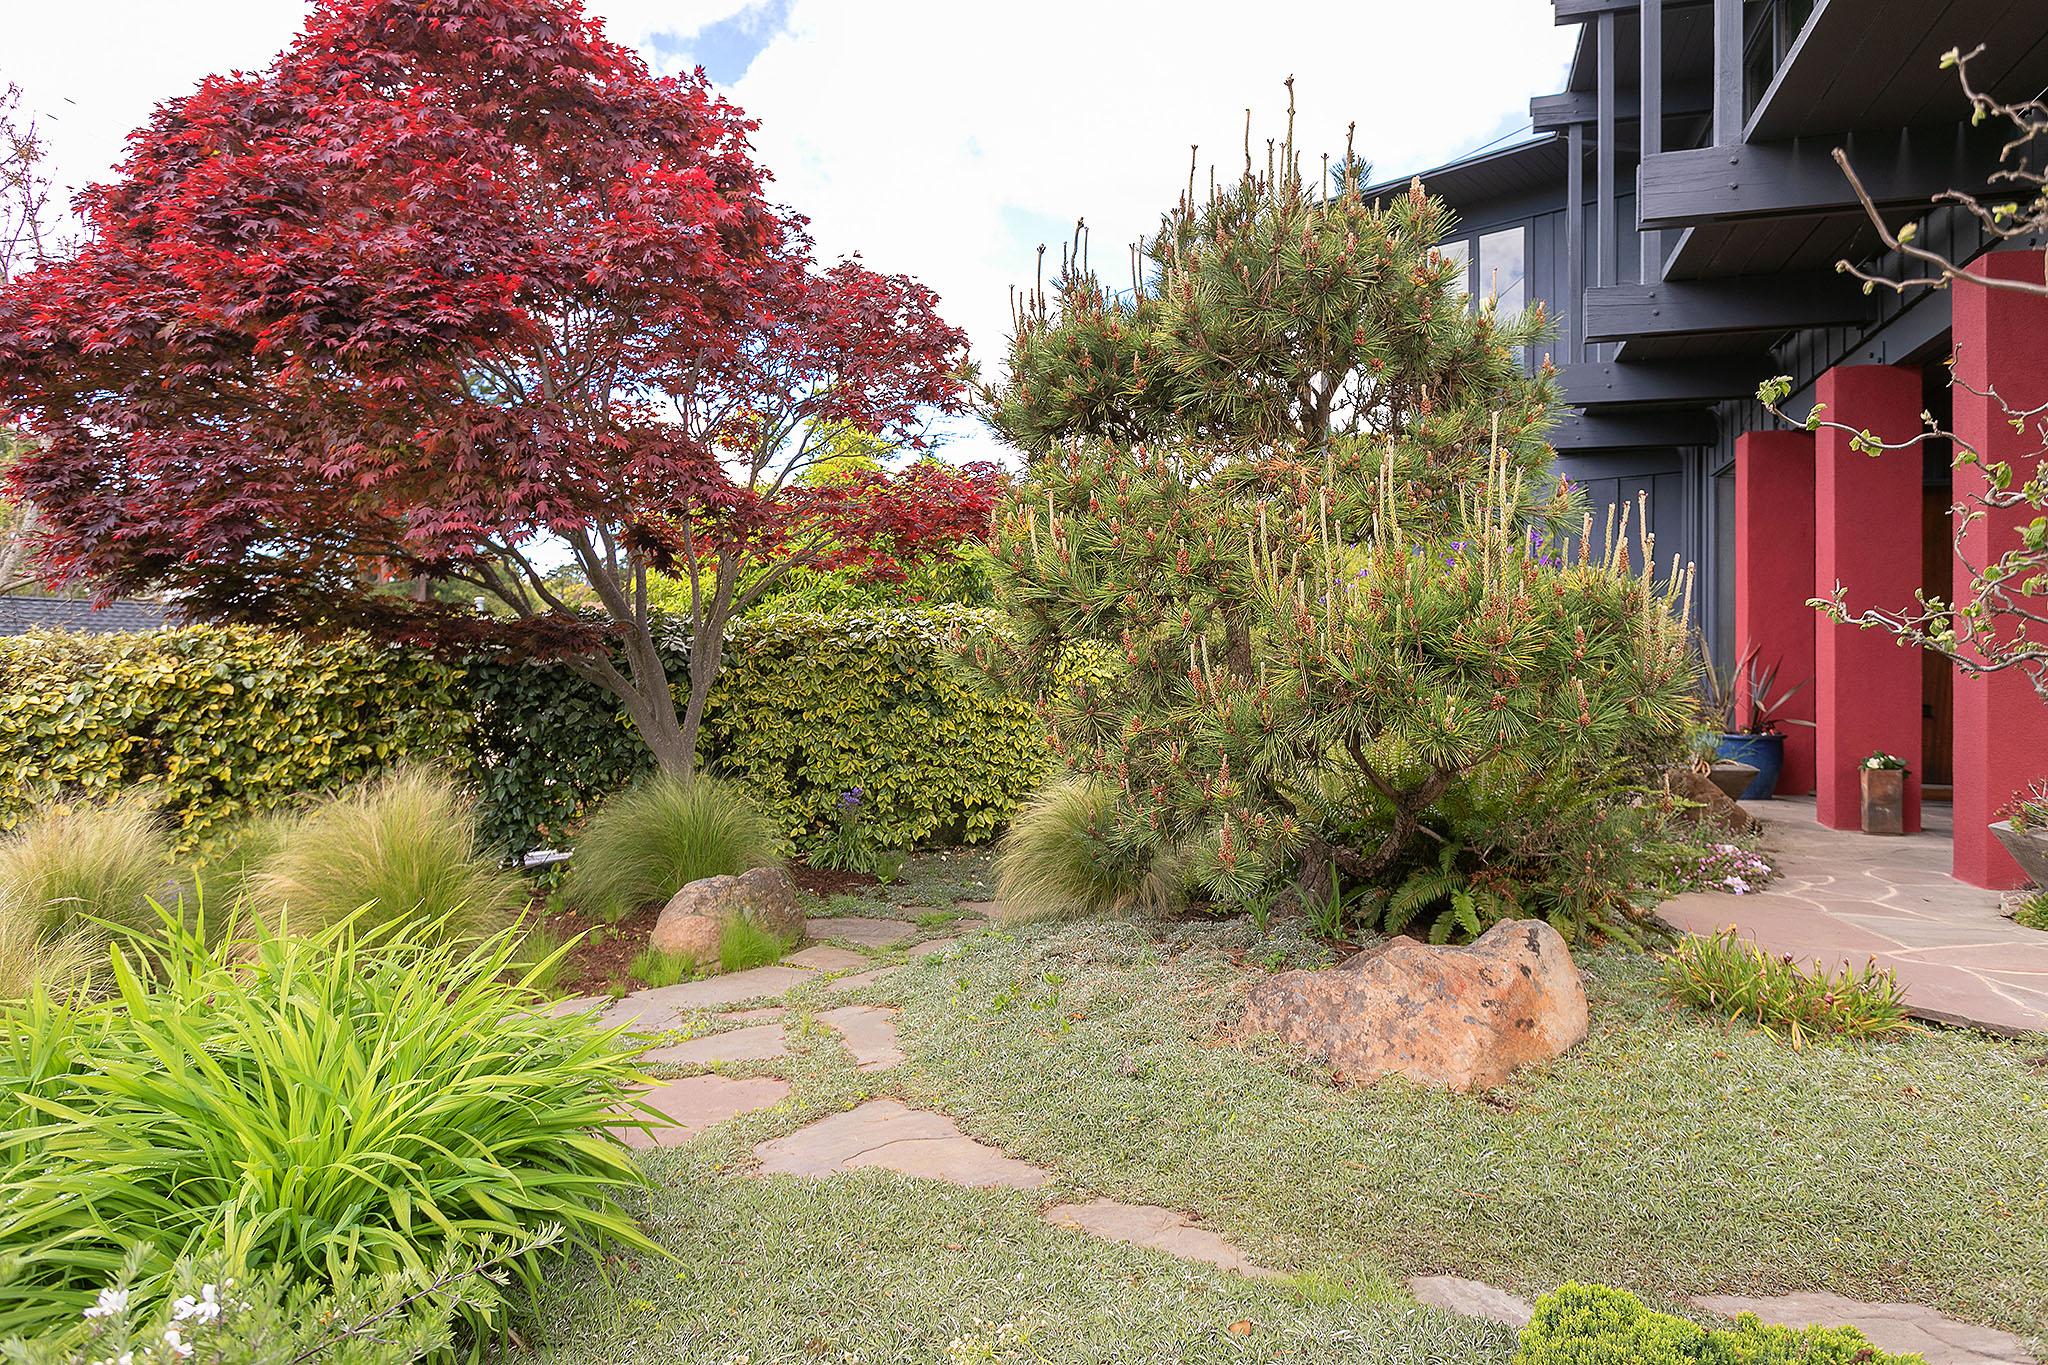 40 Front garden2.jpg